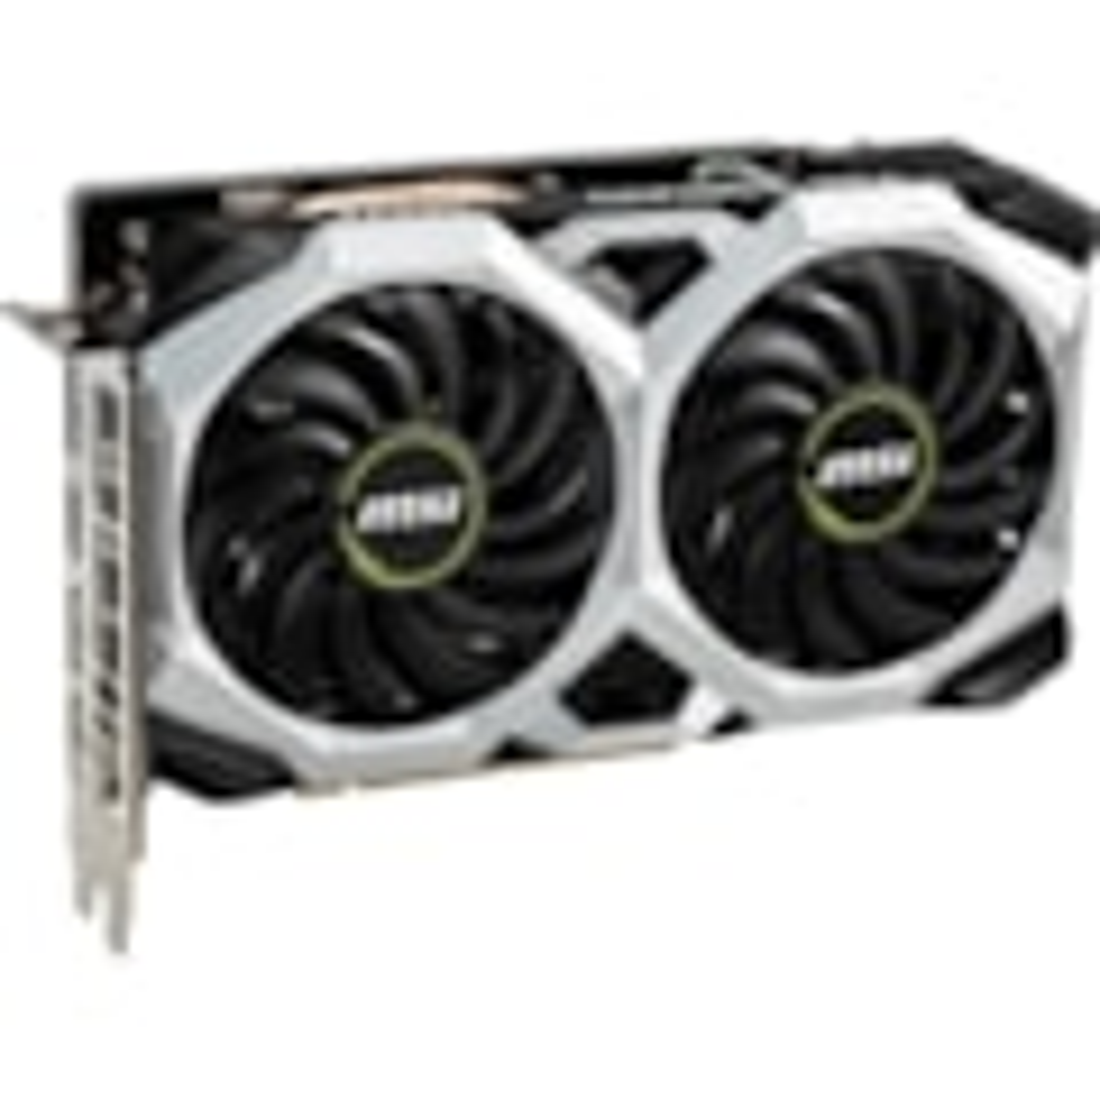 MSI VENTUS GeForce GTX 1660 Ti VENTUS XS 6G OC GeForce GTX 1660 Ti Graphic Card - 6 GB GDDR6